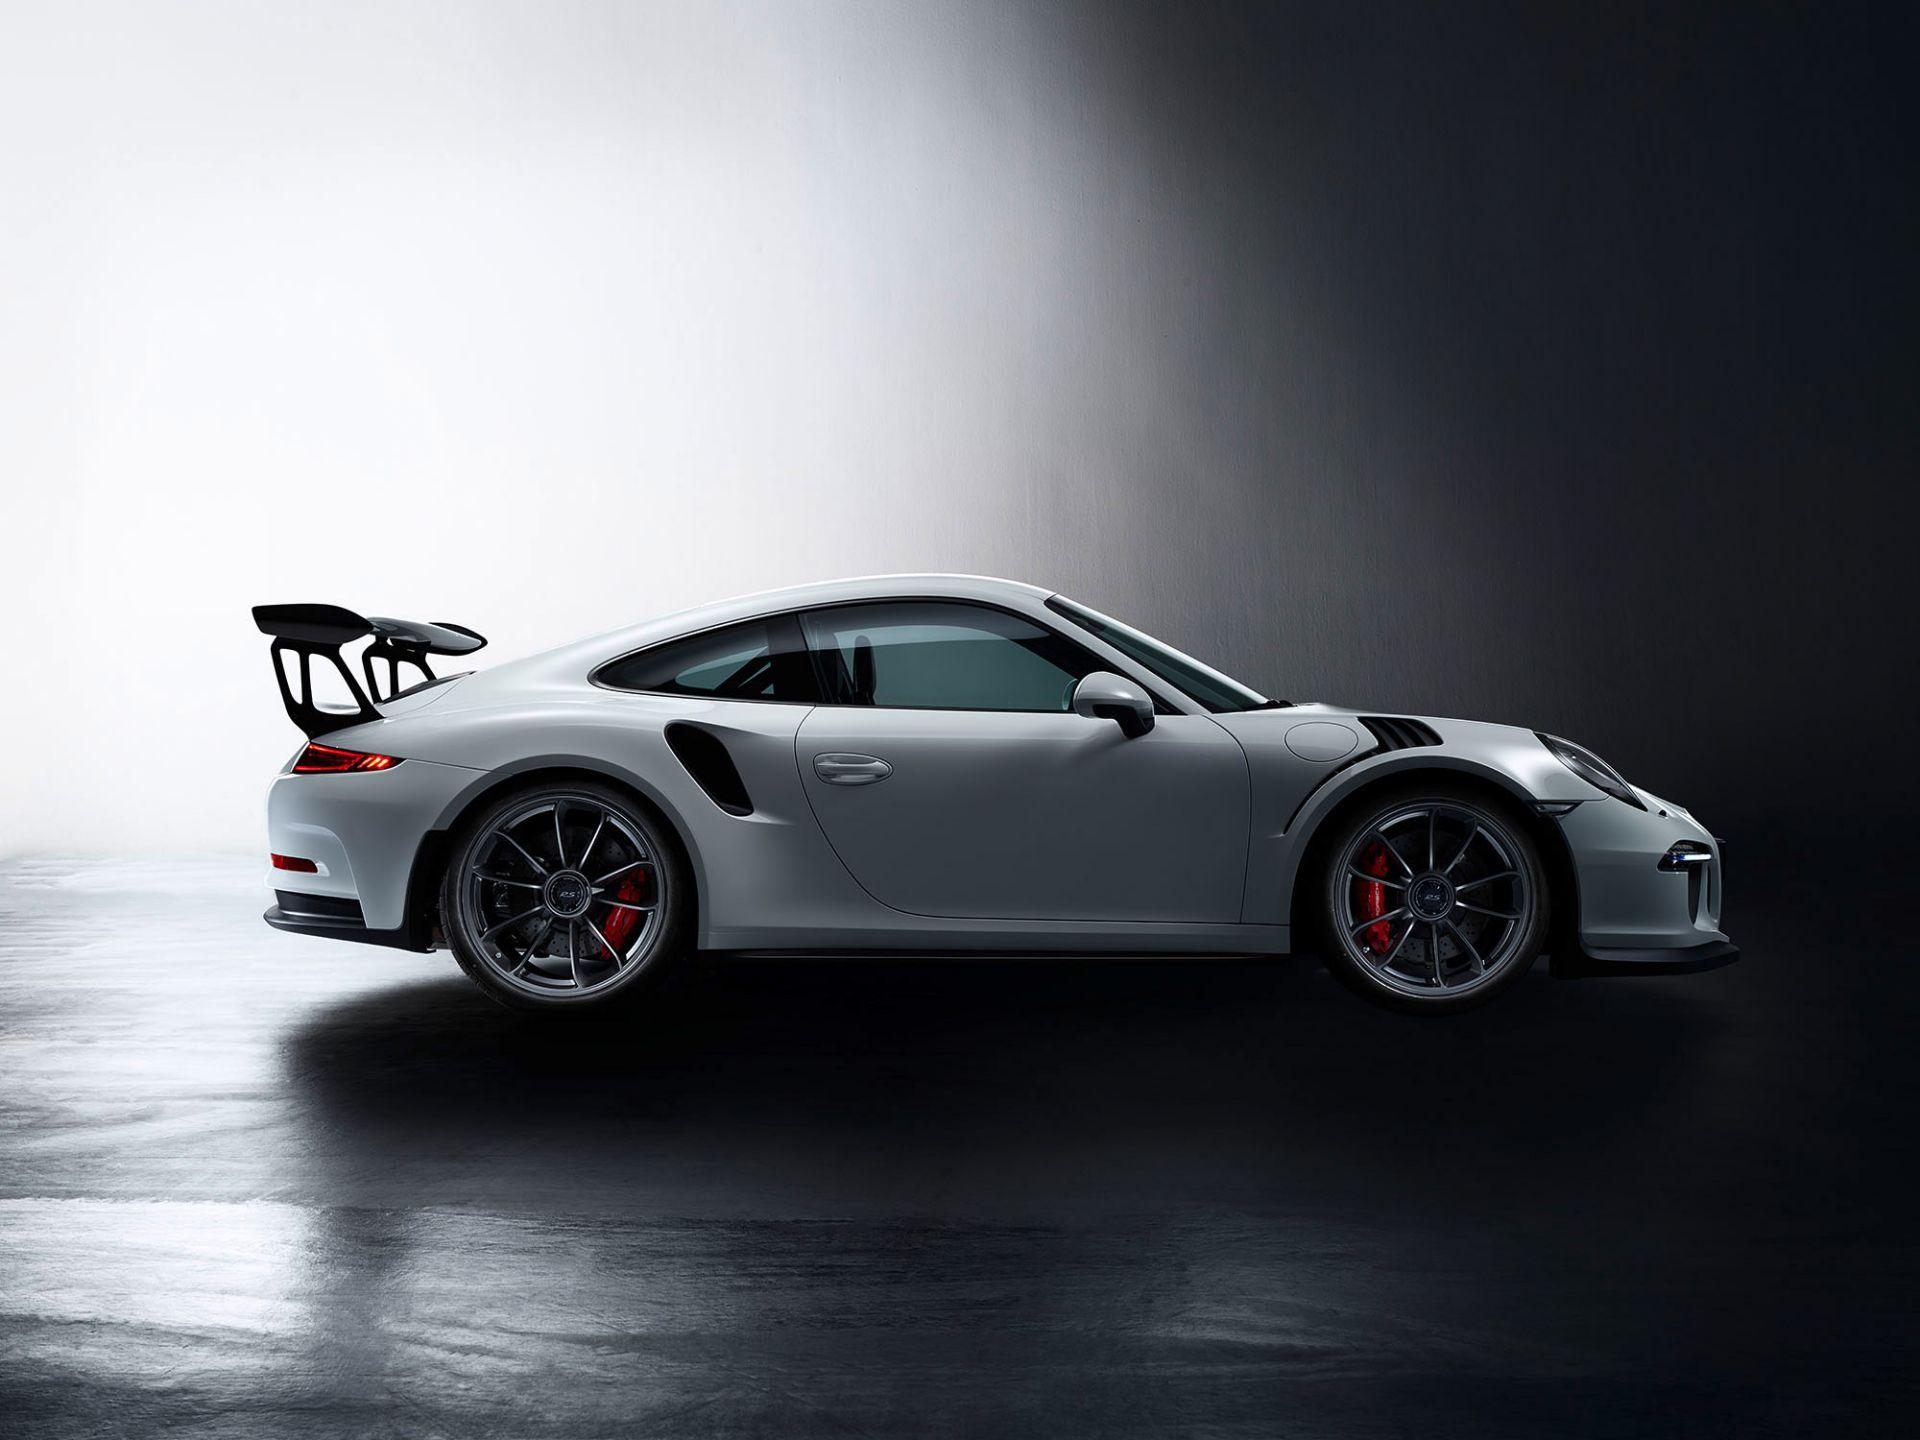 Los 5 - Triptichon Porsche 911 GT 3 RS Galeriepreis: 3300,00 Euro Drei Motive in Fine Art Print Format: 80 x